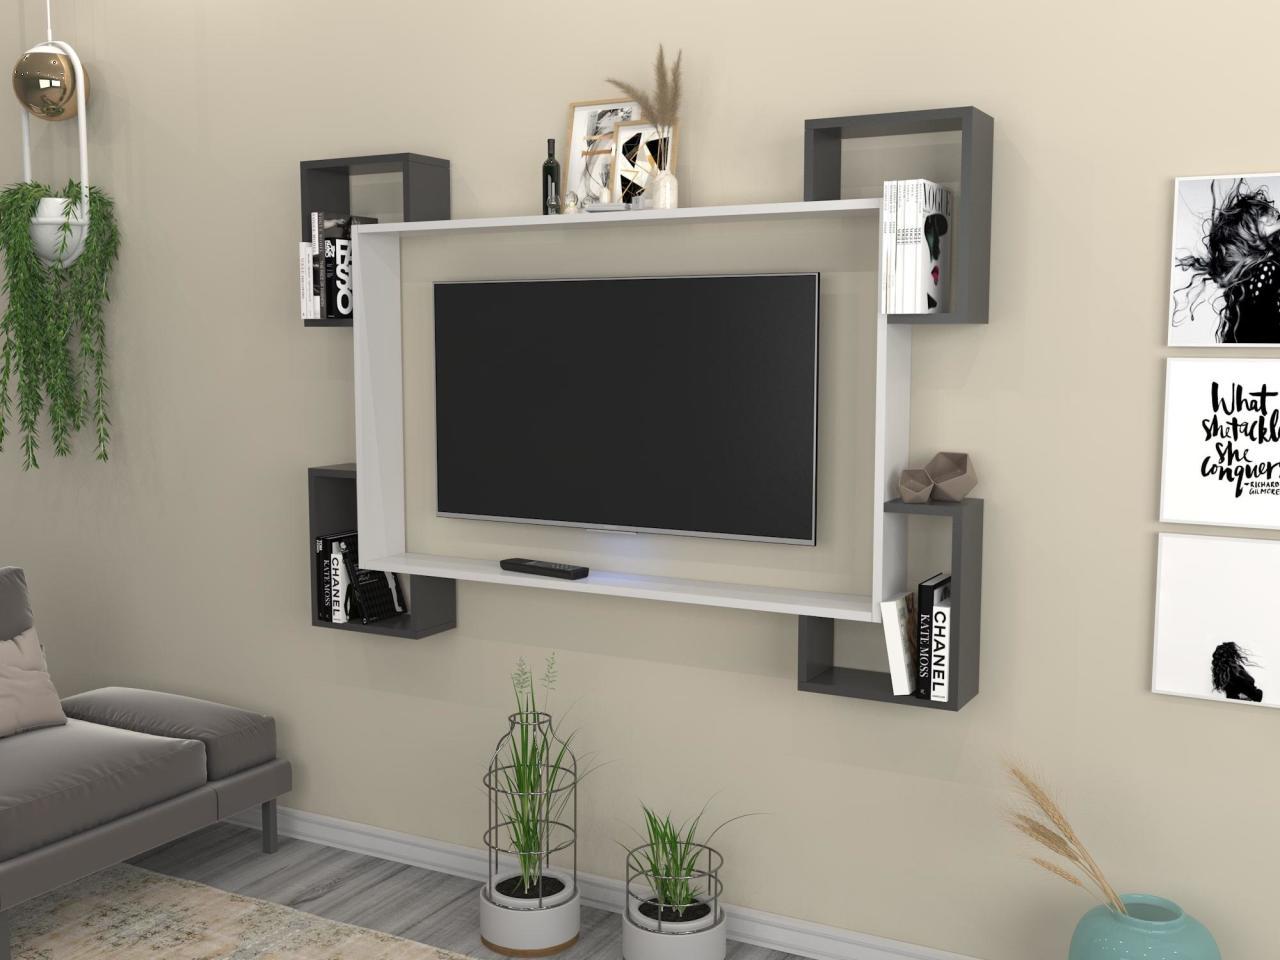 Home Furniture Tv Furniture TV Table TV Cabinet Wall TV Unit Trendsetter Bookcase Shelf Wall Tv Unit White Anthracite